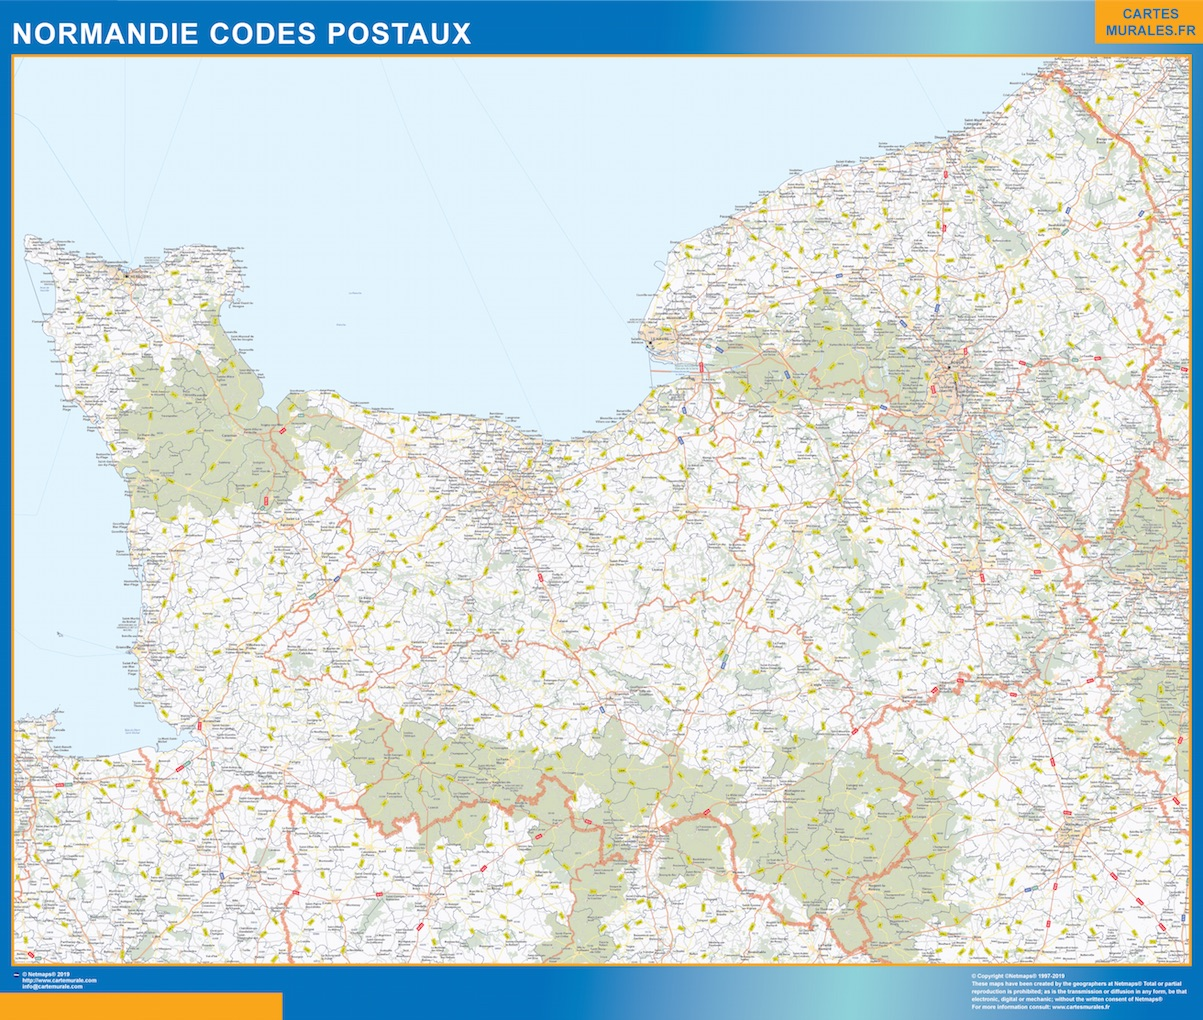 Carte Normandie codes postaux